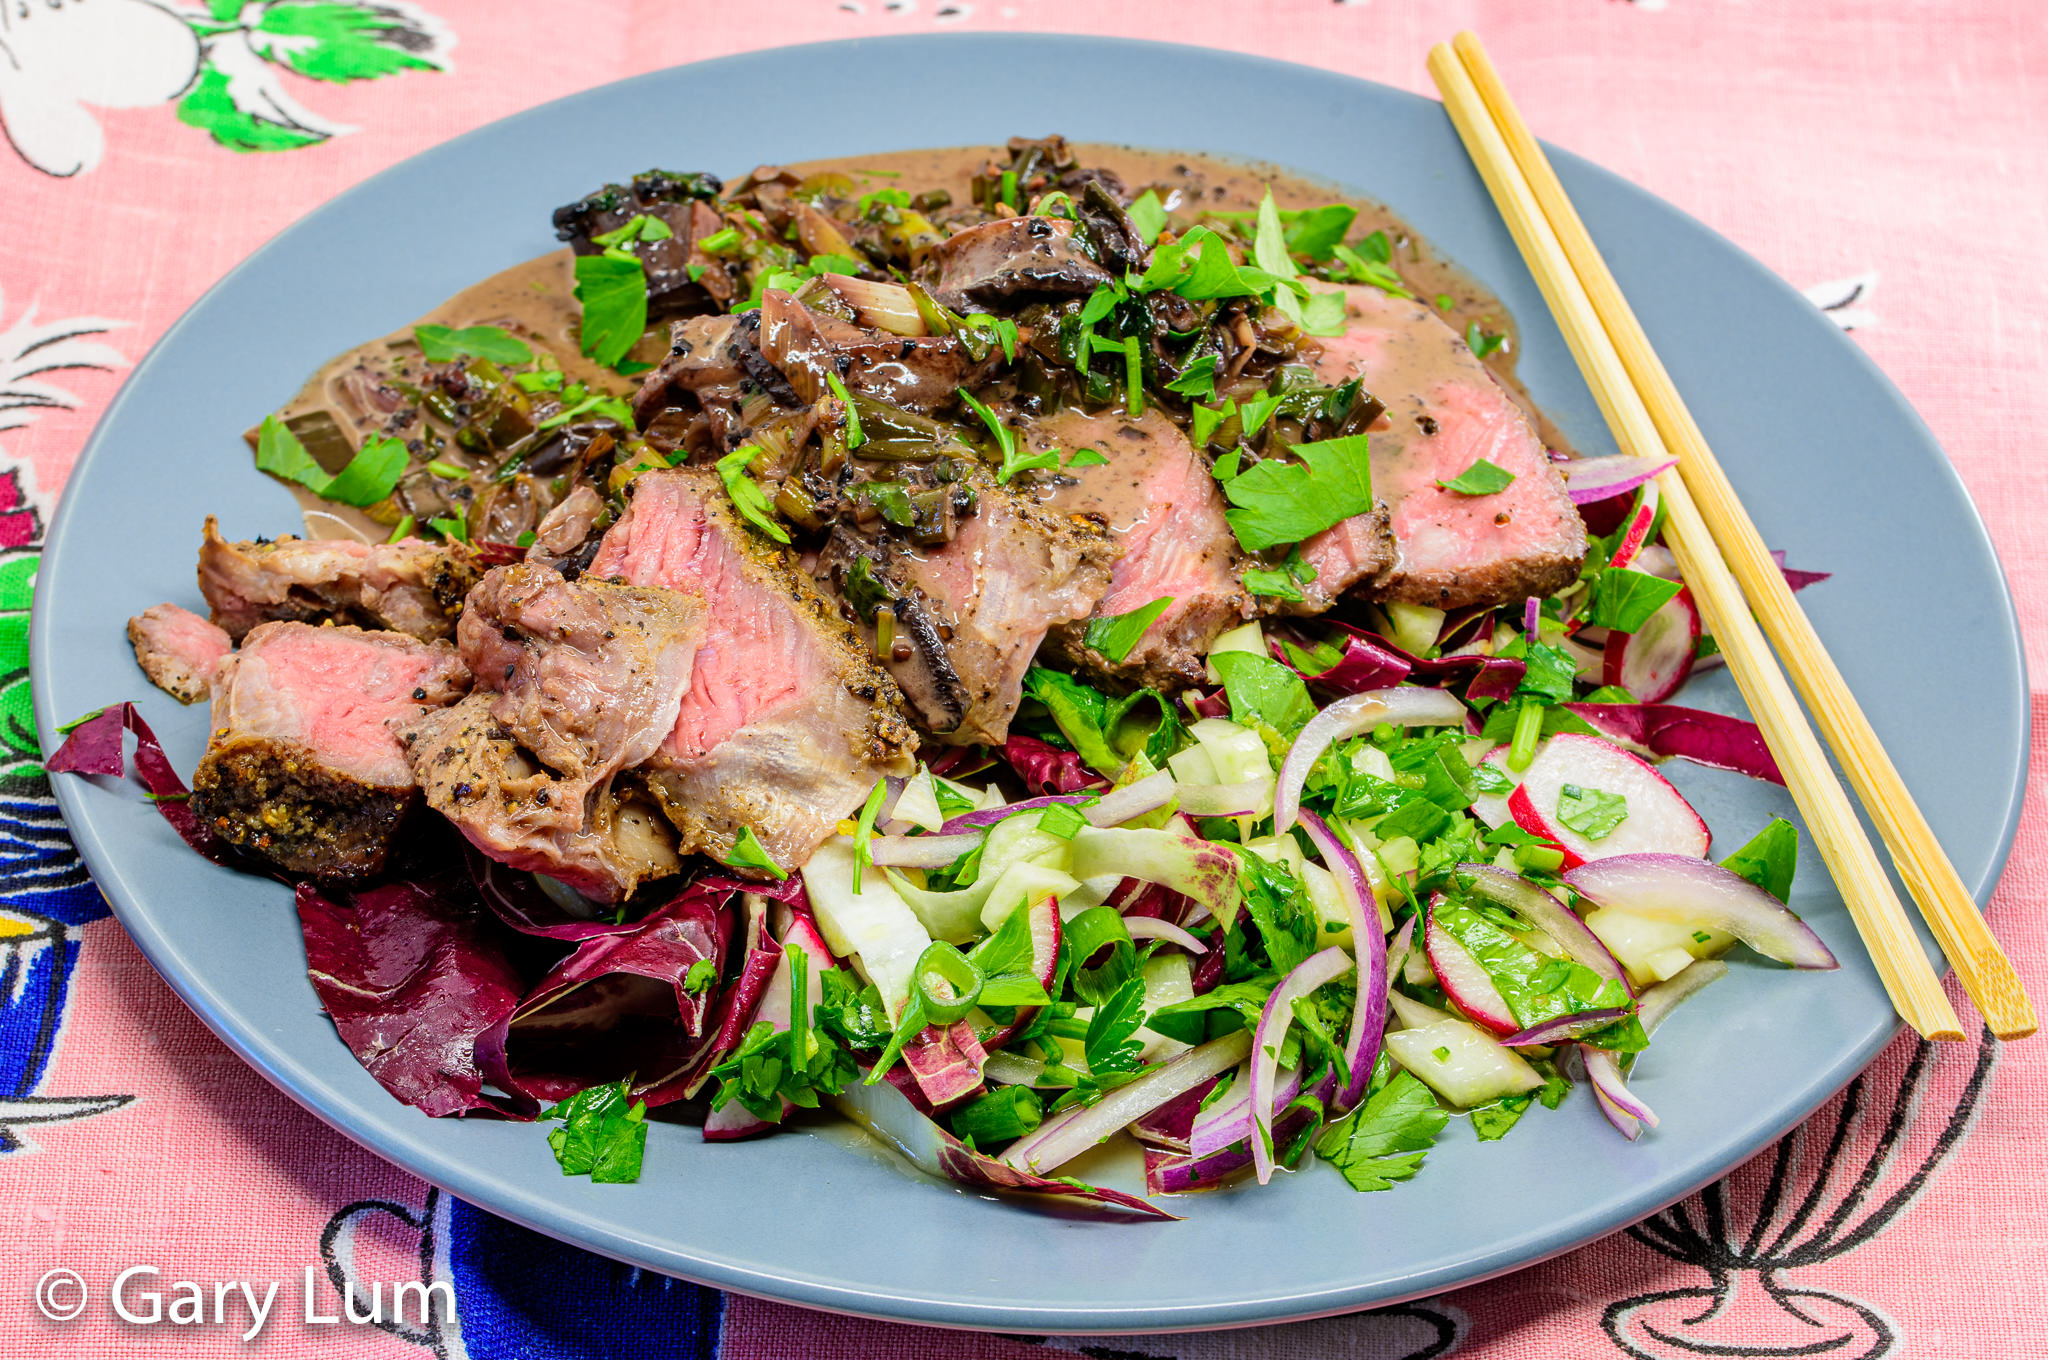 Porterhouse steak and radicchio salad. Gary Lum.